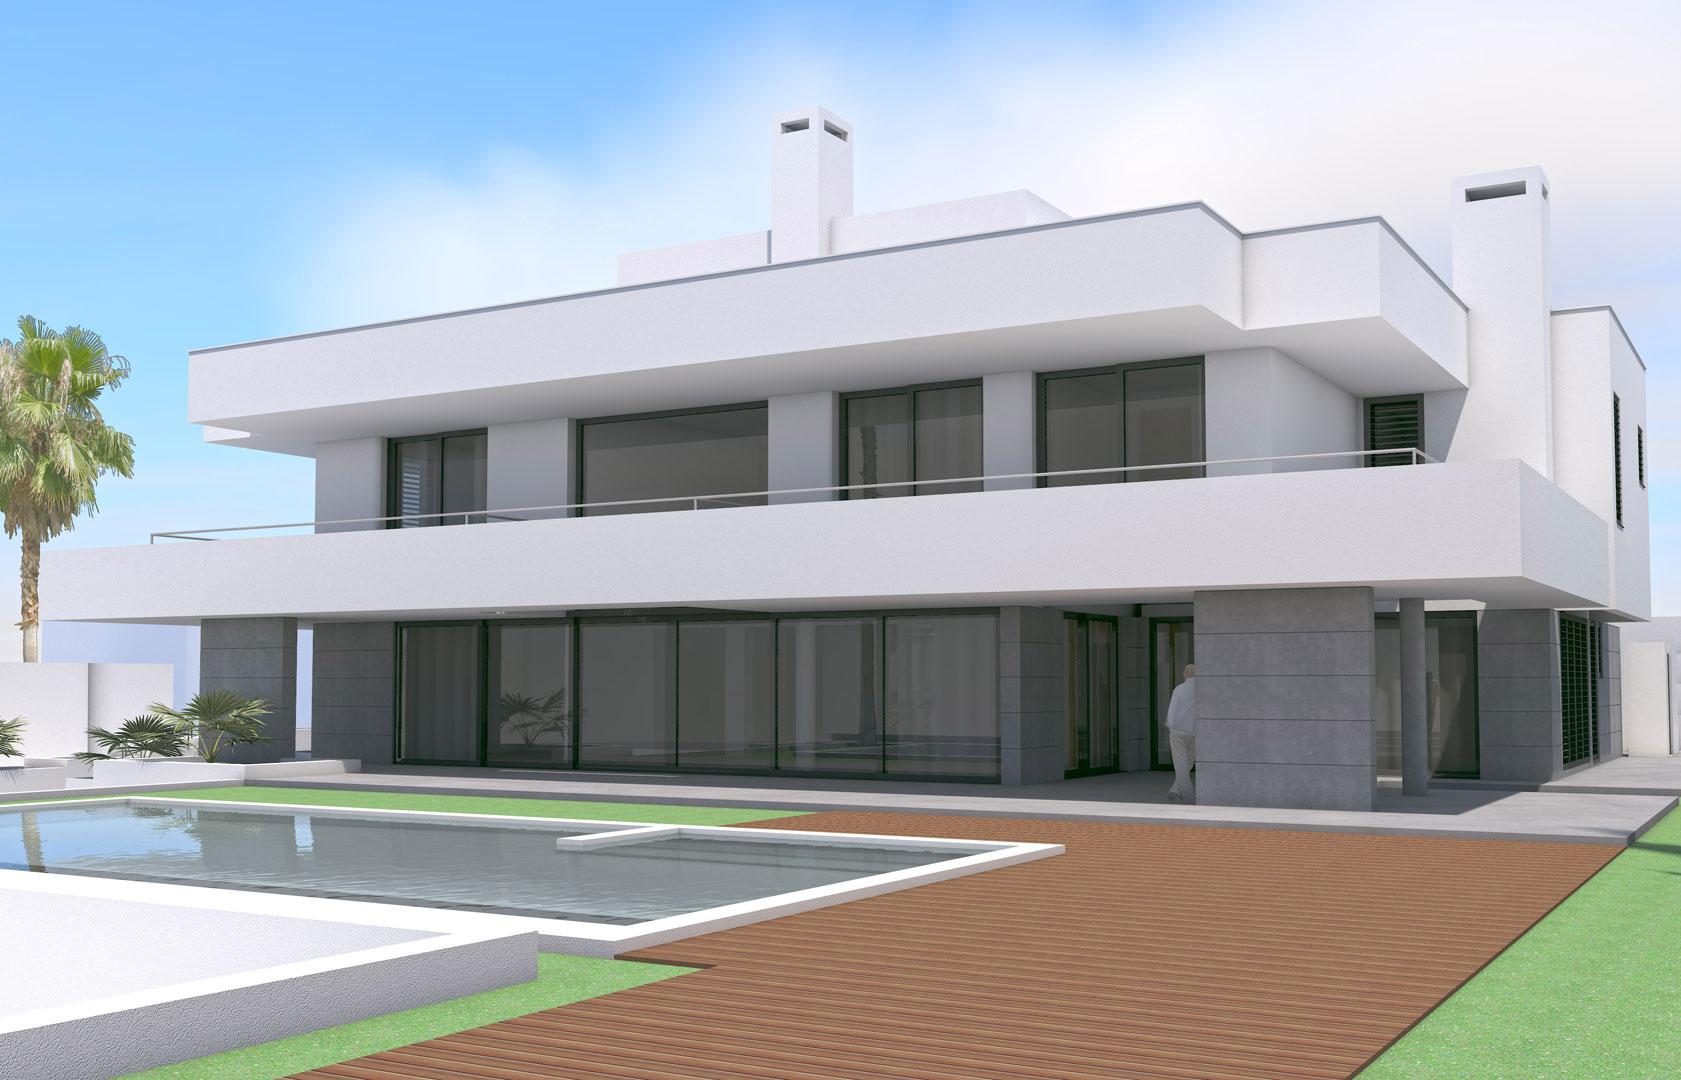 Vivienda unifamiliar en aguadulce g ngora arquitectos - Vivienda en almeria ...